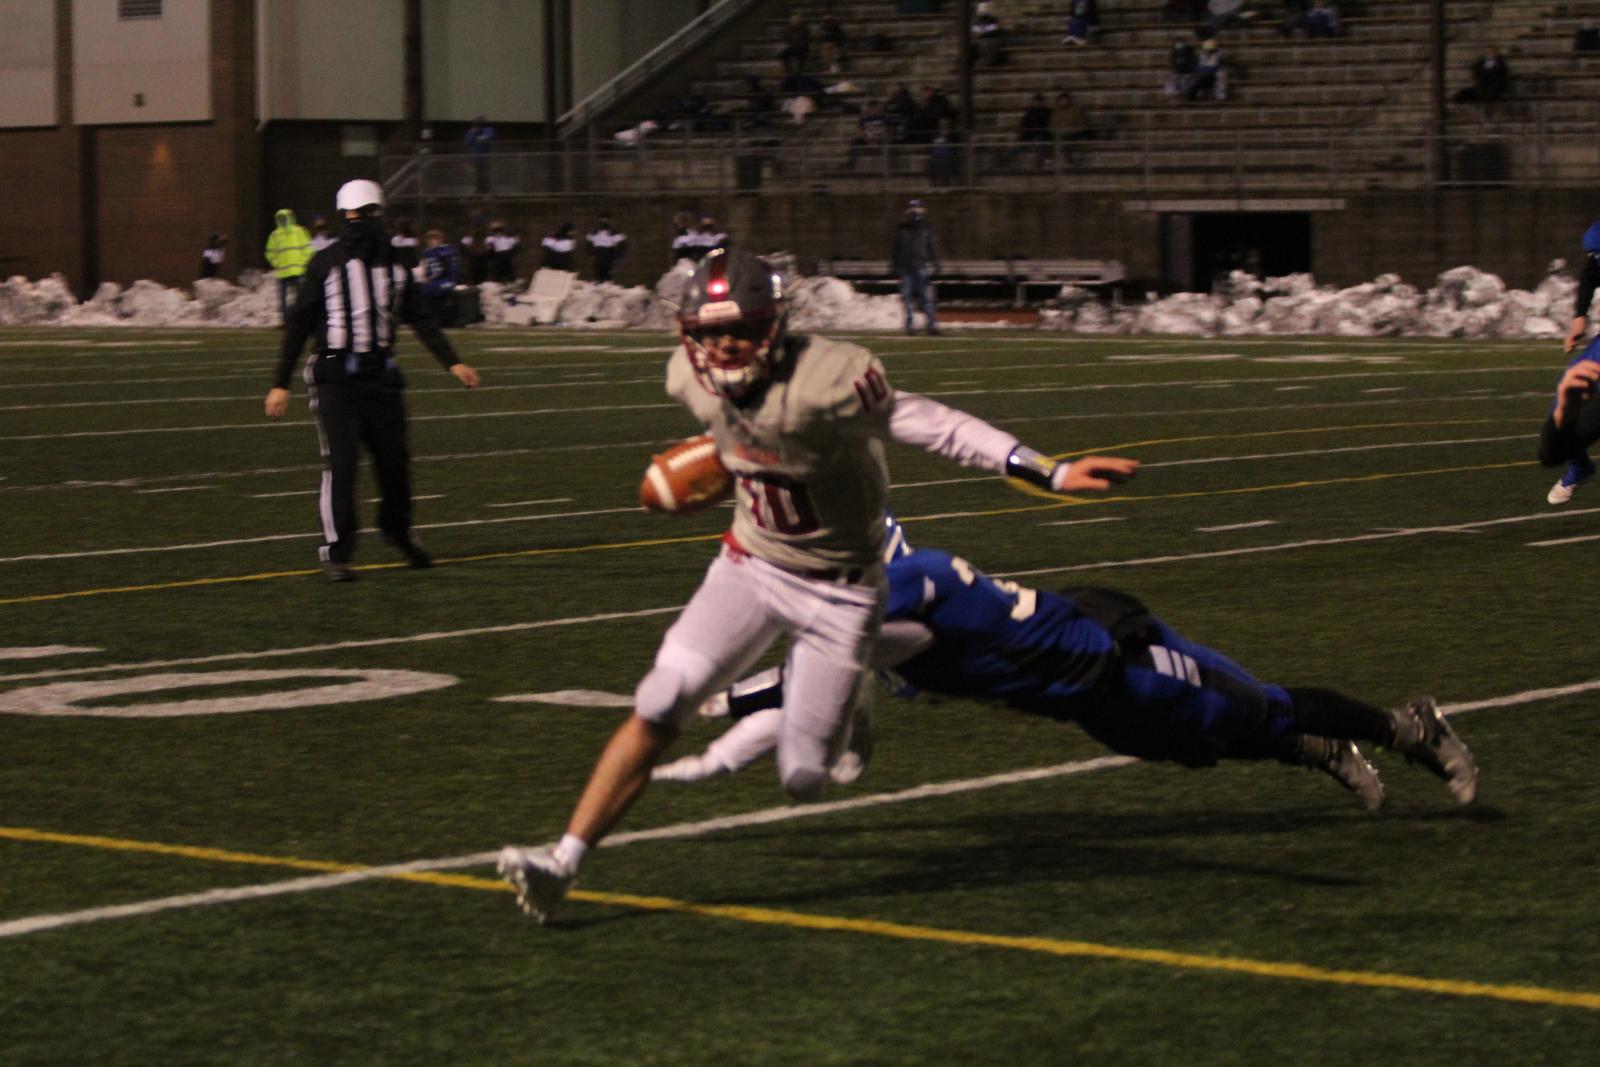 Hoquiam v. Elma Varsity Football 2/15/21 (13-27 Loss) – Photos by Ben Winkelman